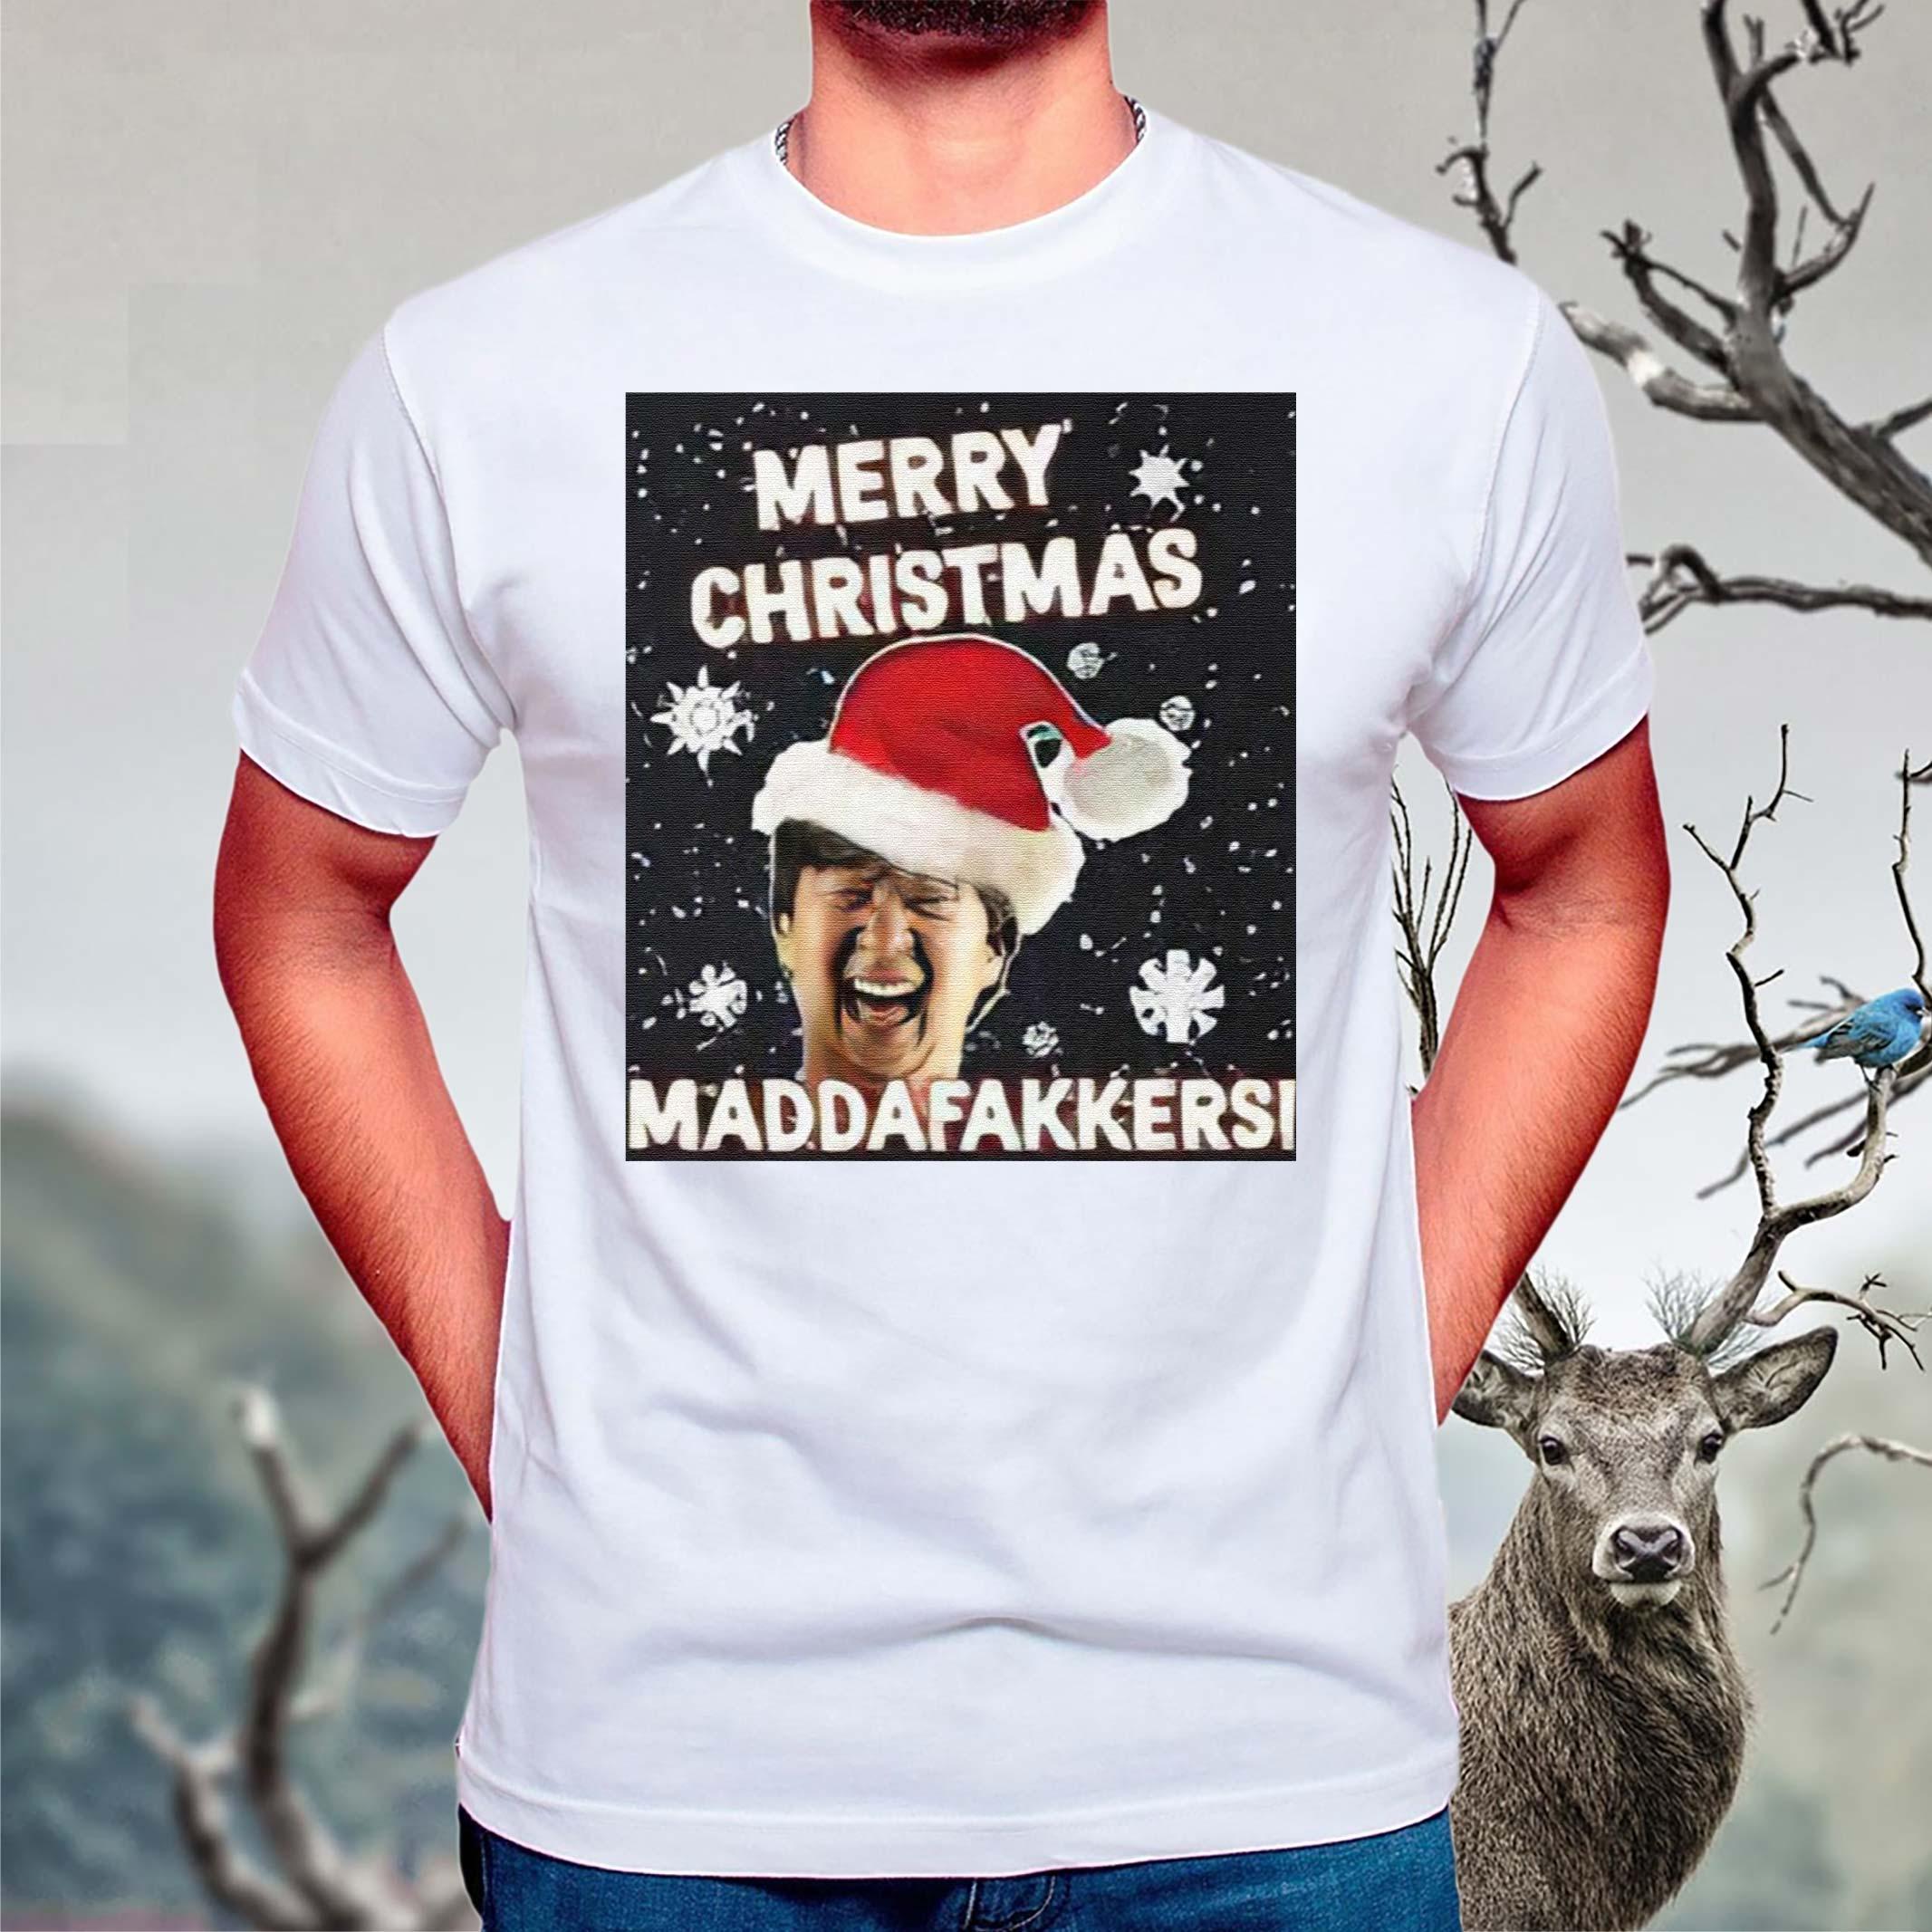 Mr-Chow-Hangover-Merry-Christmas-Maddafakkers-T-Shirts